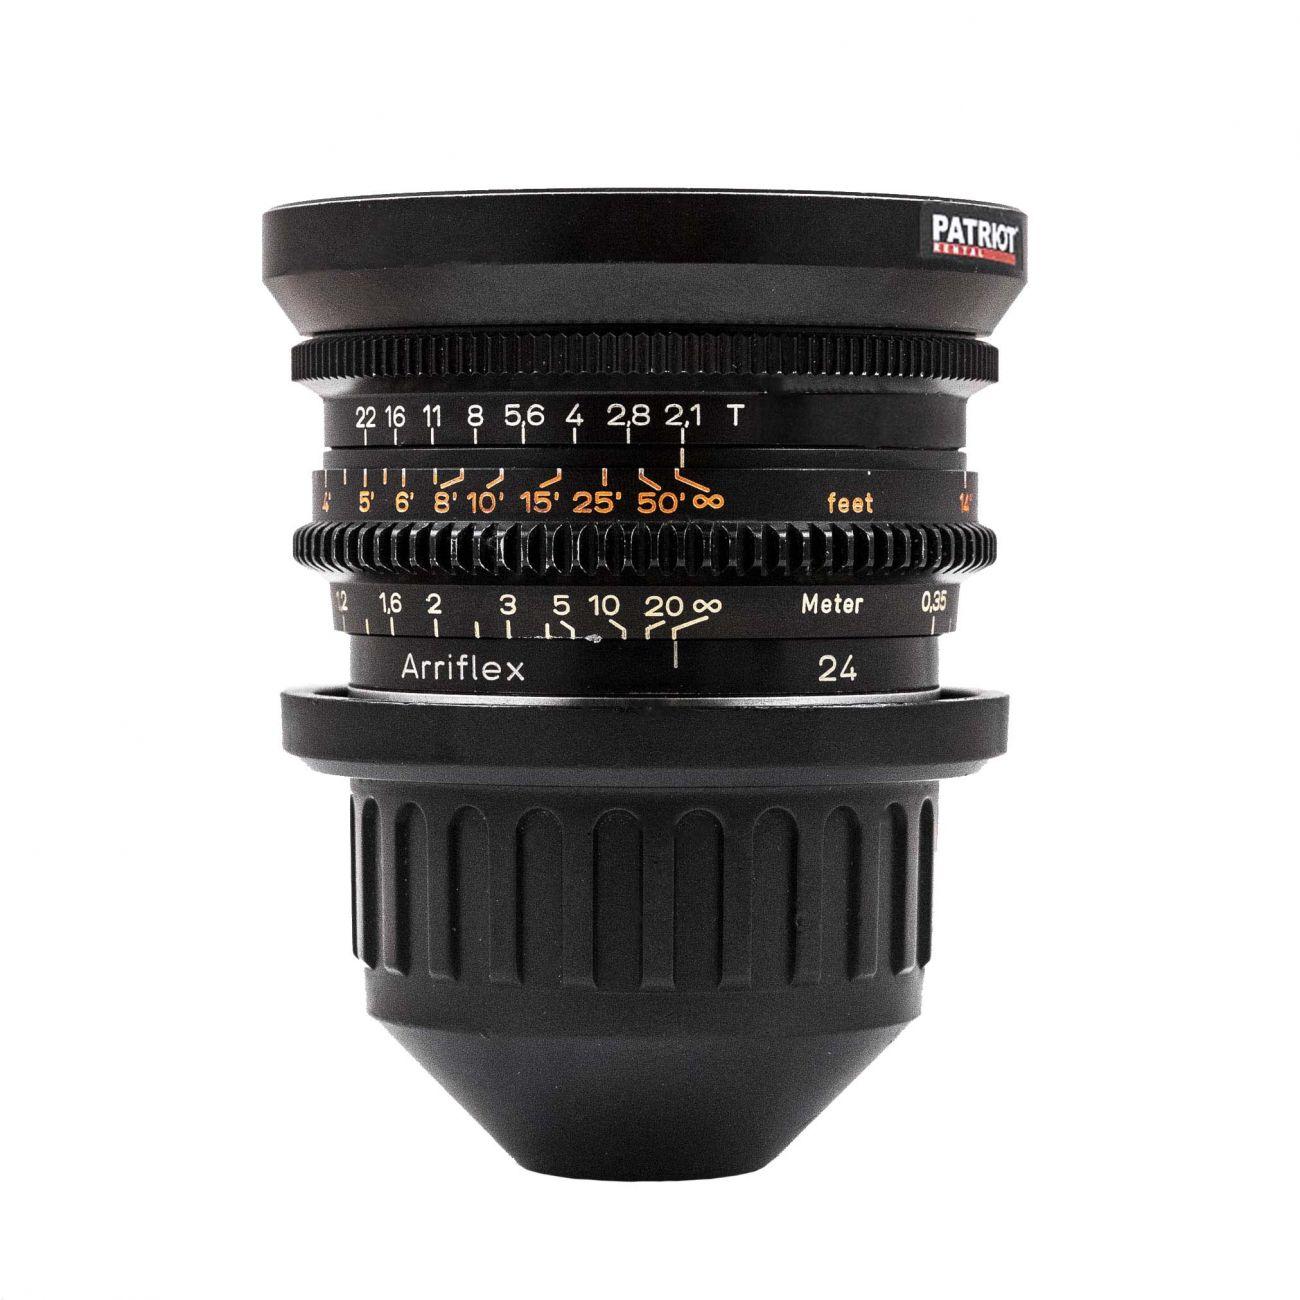 24 mm ZEISS PRIME Lens T2.1